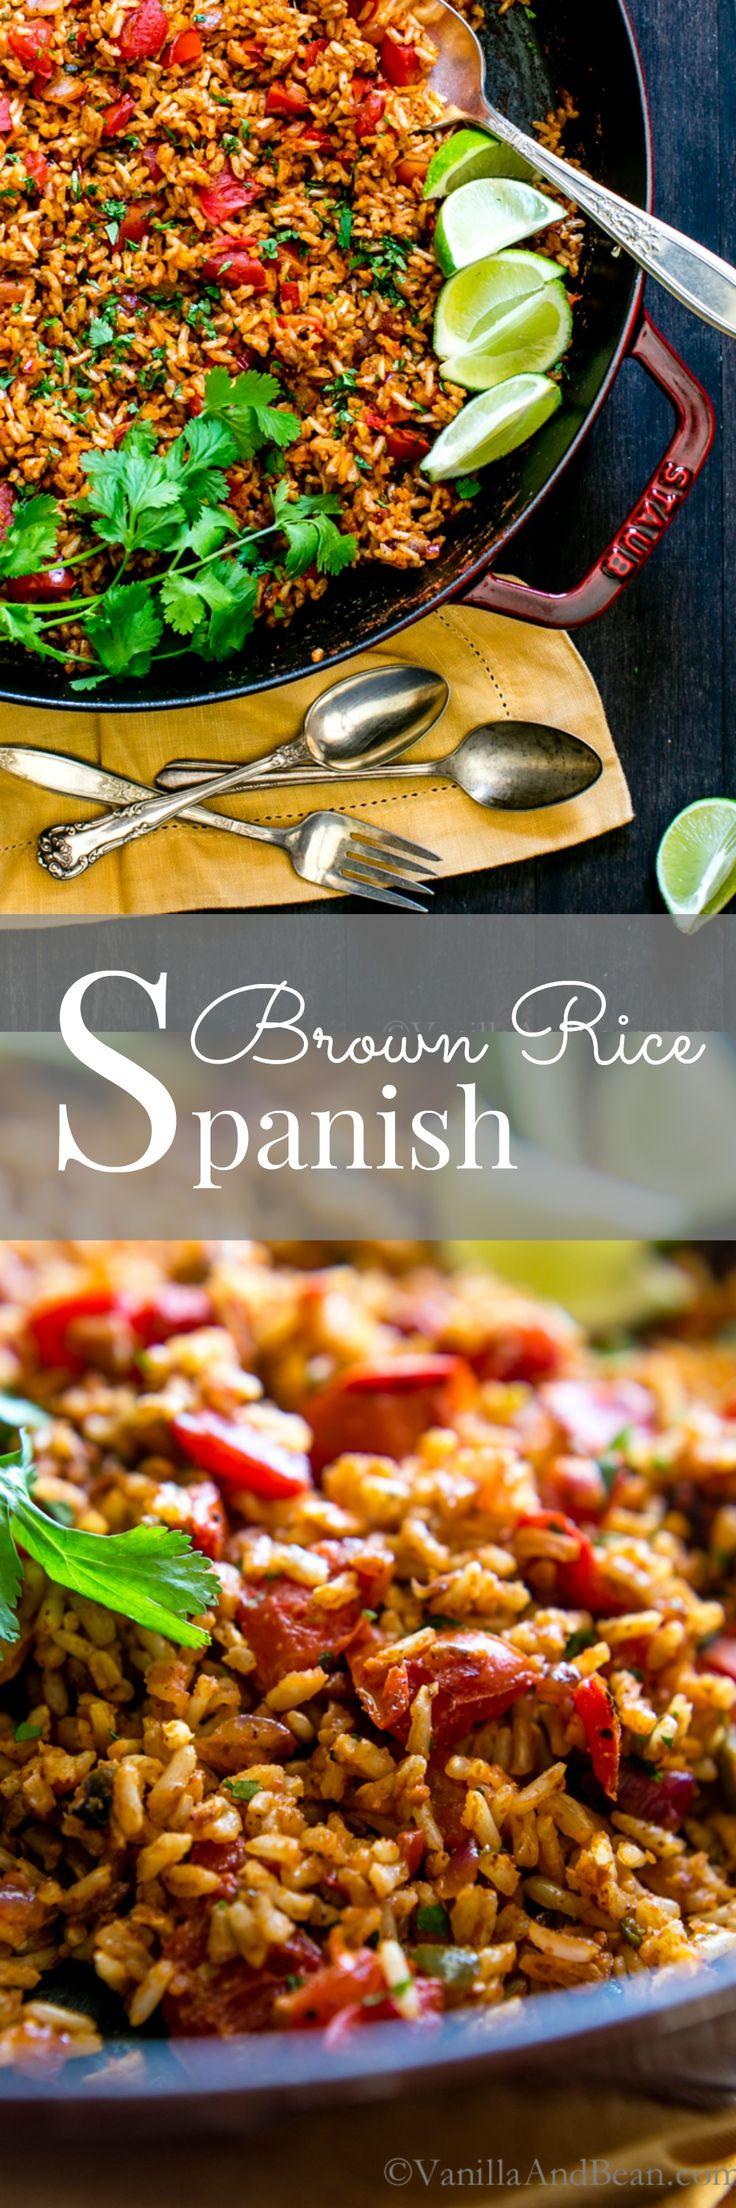 Spanish Brown Rice Lean Recipesrice Recipescooking